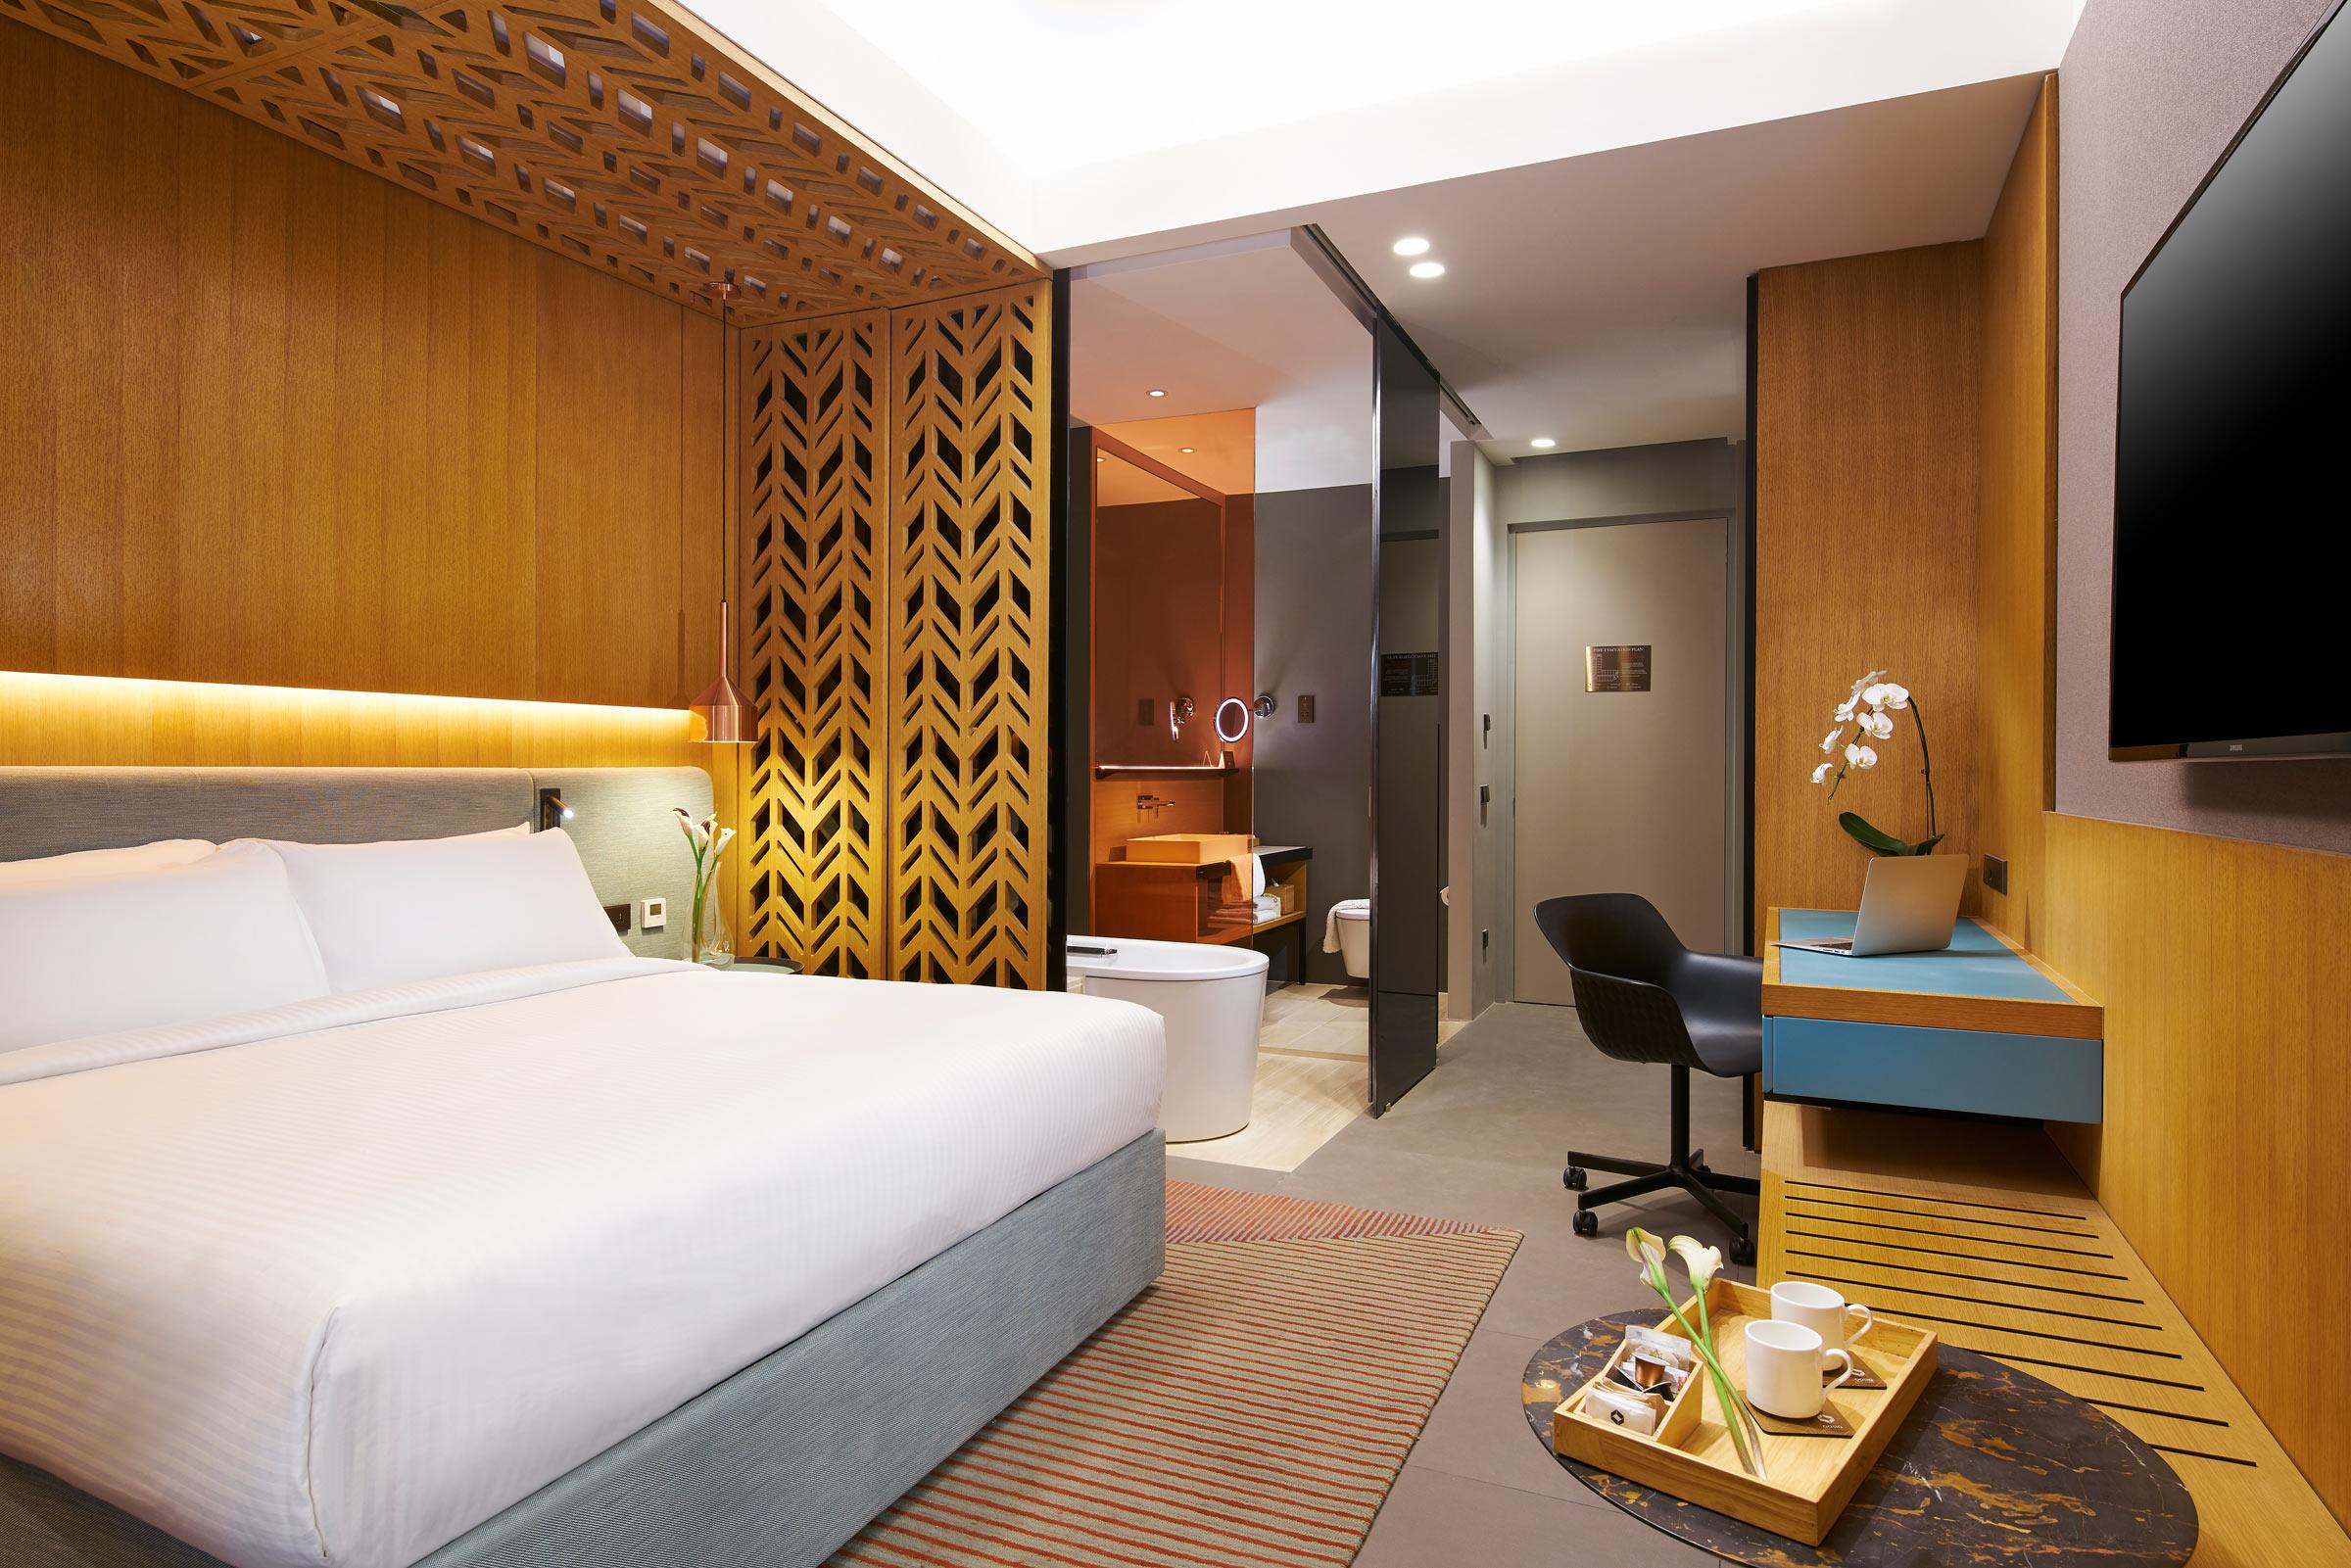 Oasia-Hotel-Downtown,-Singapore---Club-Room.jpg